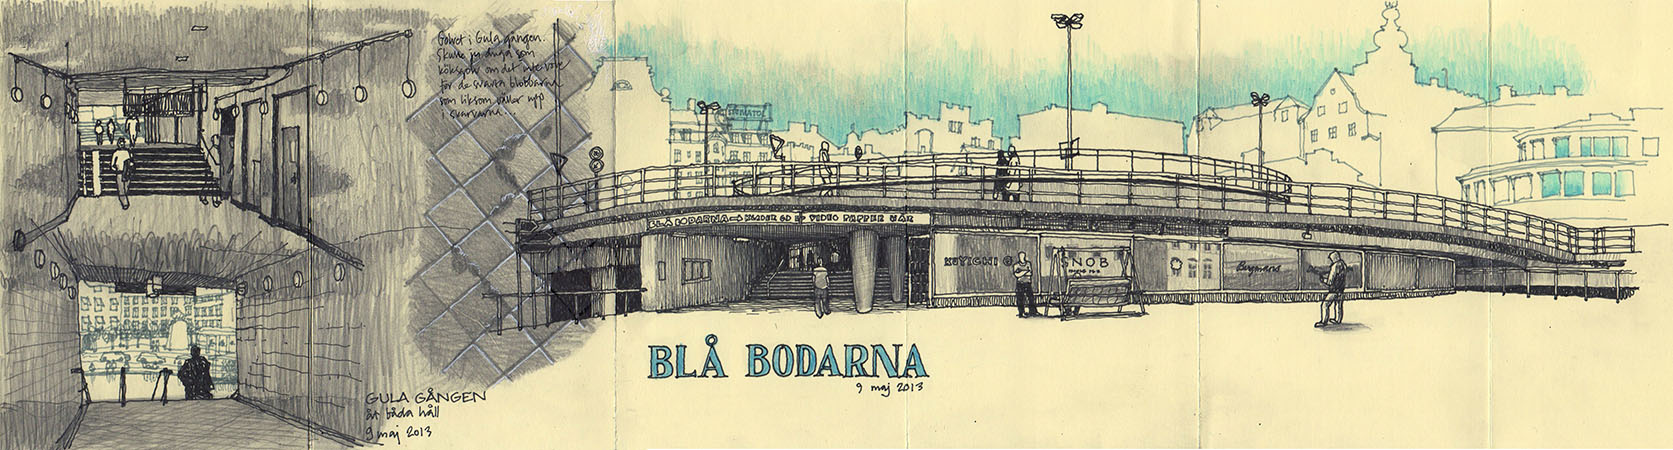 blabodarna_130509